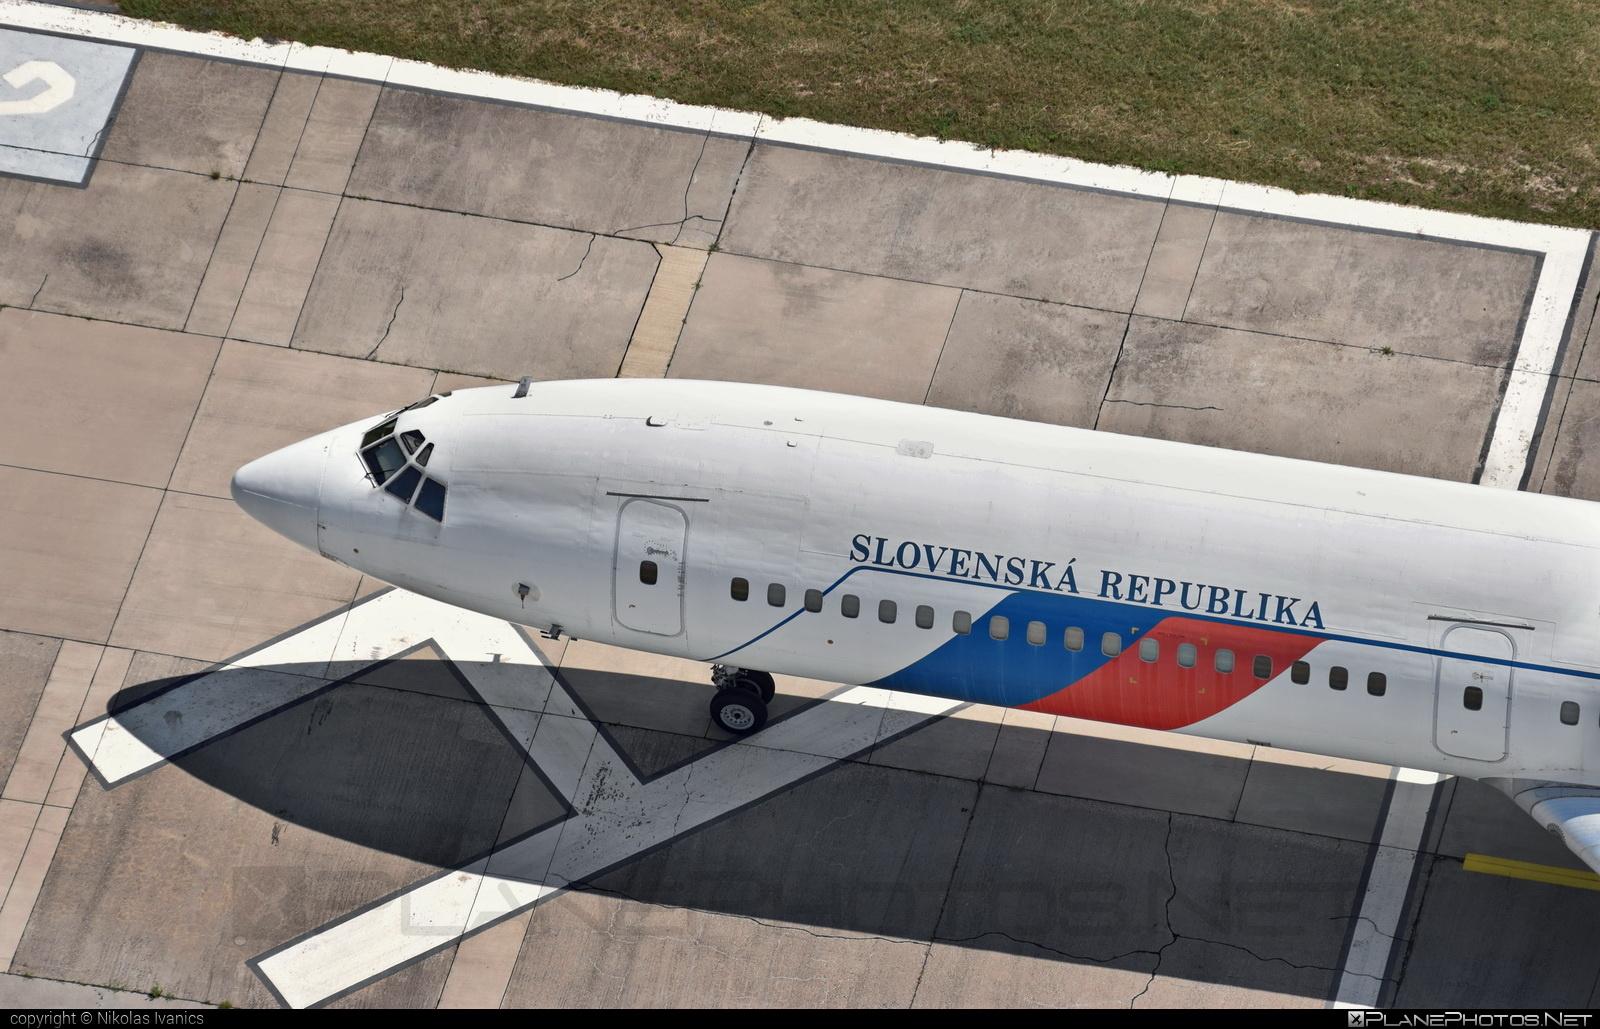 Tupolev Tu-154M - OM-BYR operated by Letecký útvar MV SR (Slovak Government Flying Service) #tu154 #tu154m #tupolev